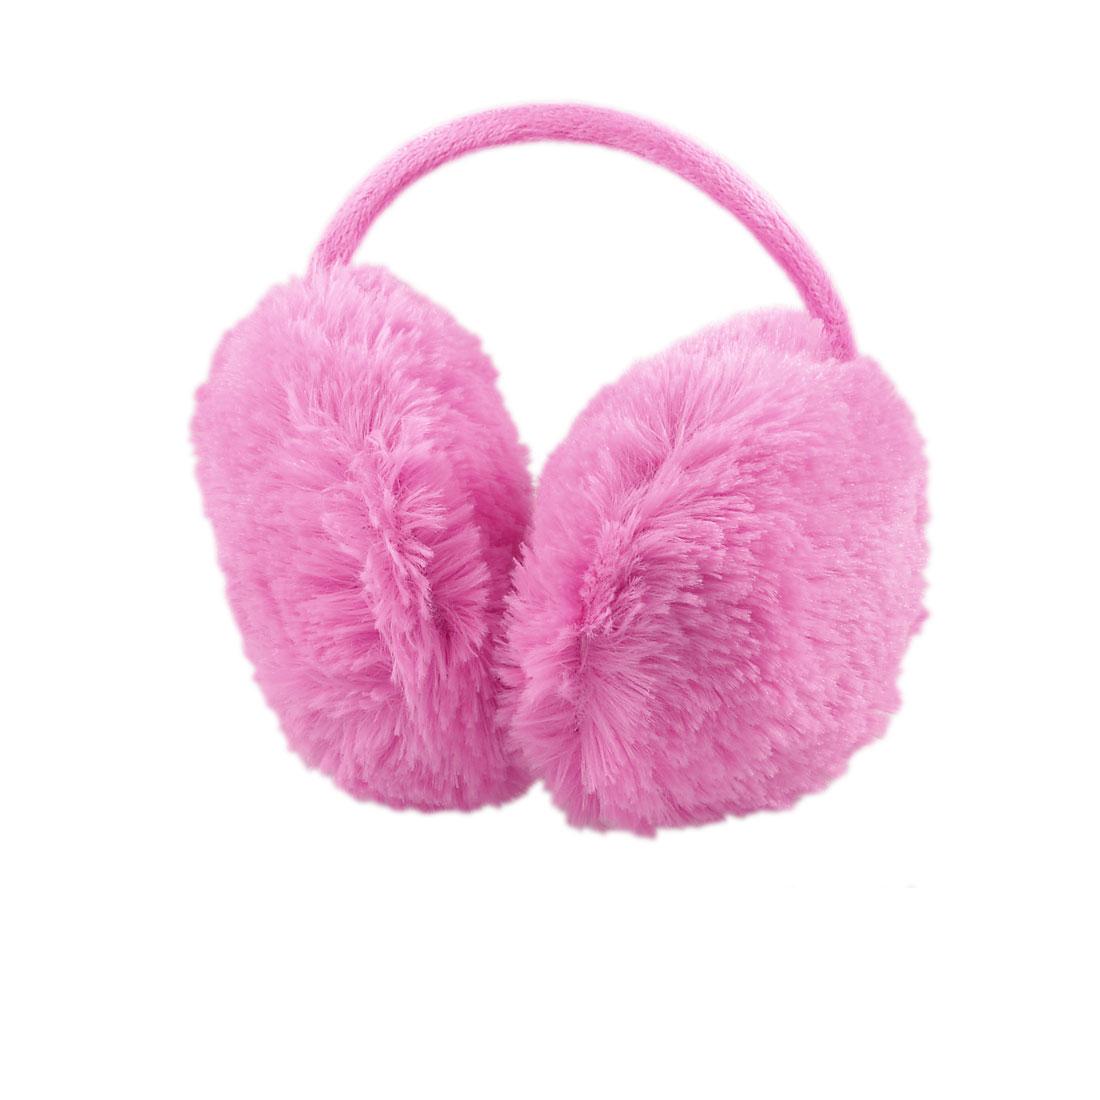 Lady Fuchsia Pure Plush Comfy Warmer Back Ear Cover Muffs Earmuffs